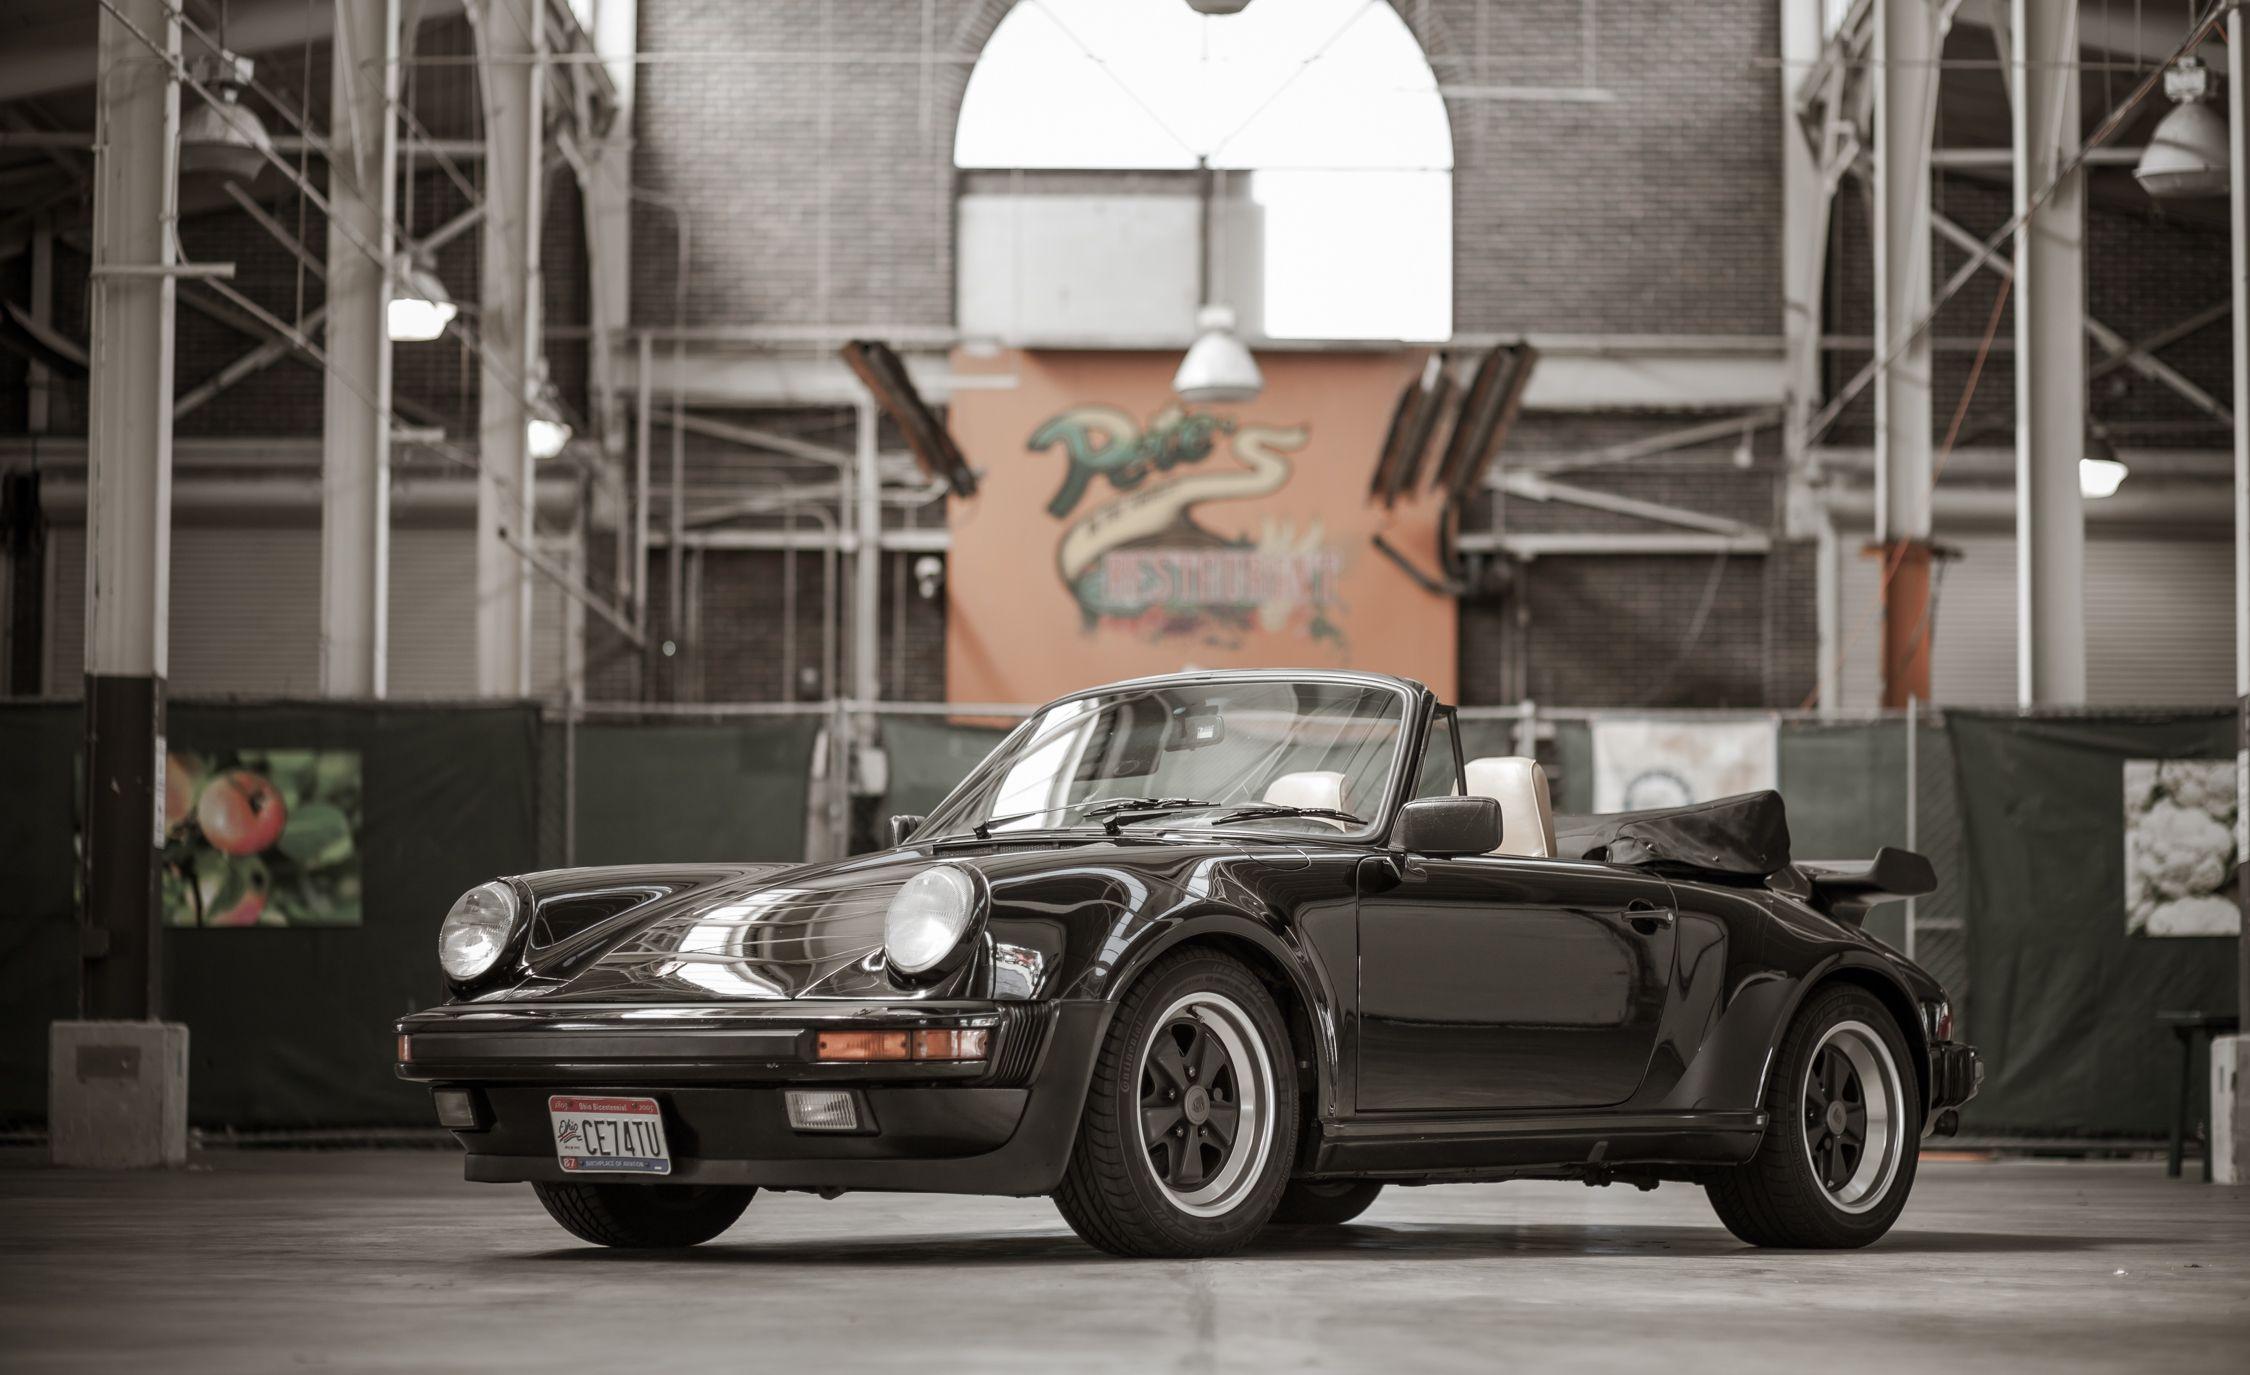 up-close-1986-porsche-911-video-car-and-driver-photo-560511-s-original Astounding Porsche 911 Gt2 Car and Driver Cars Trend